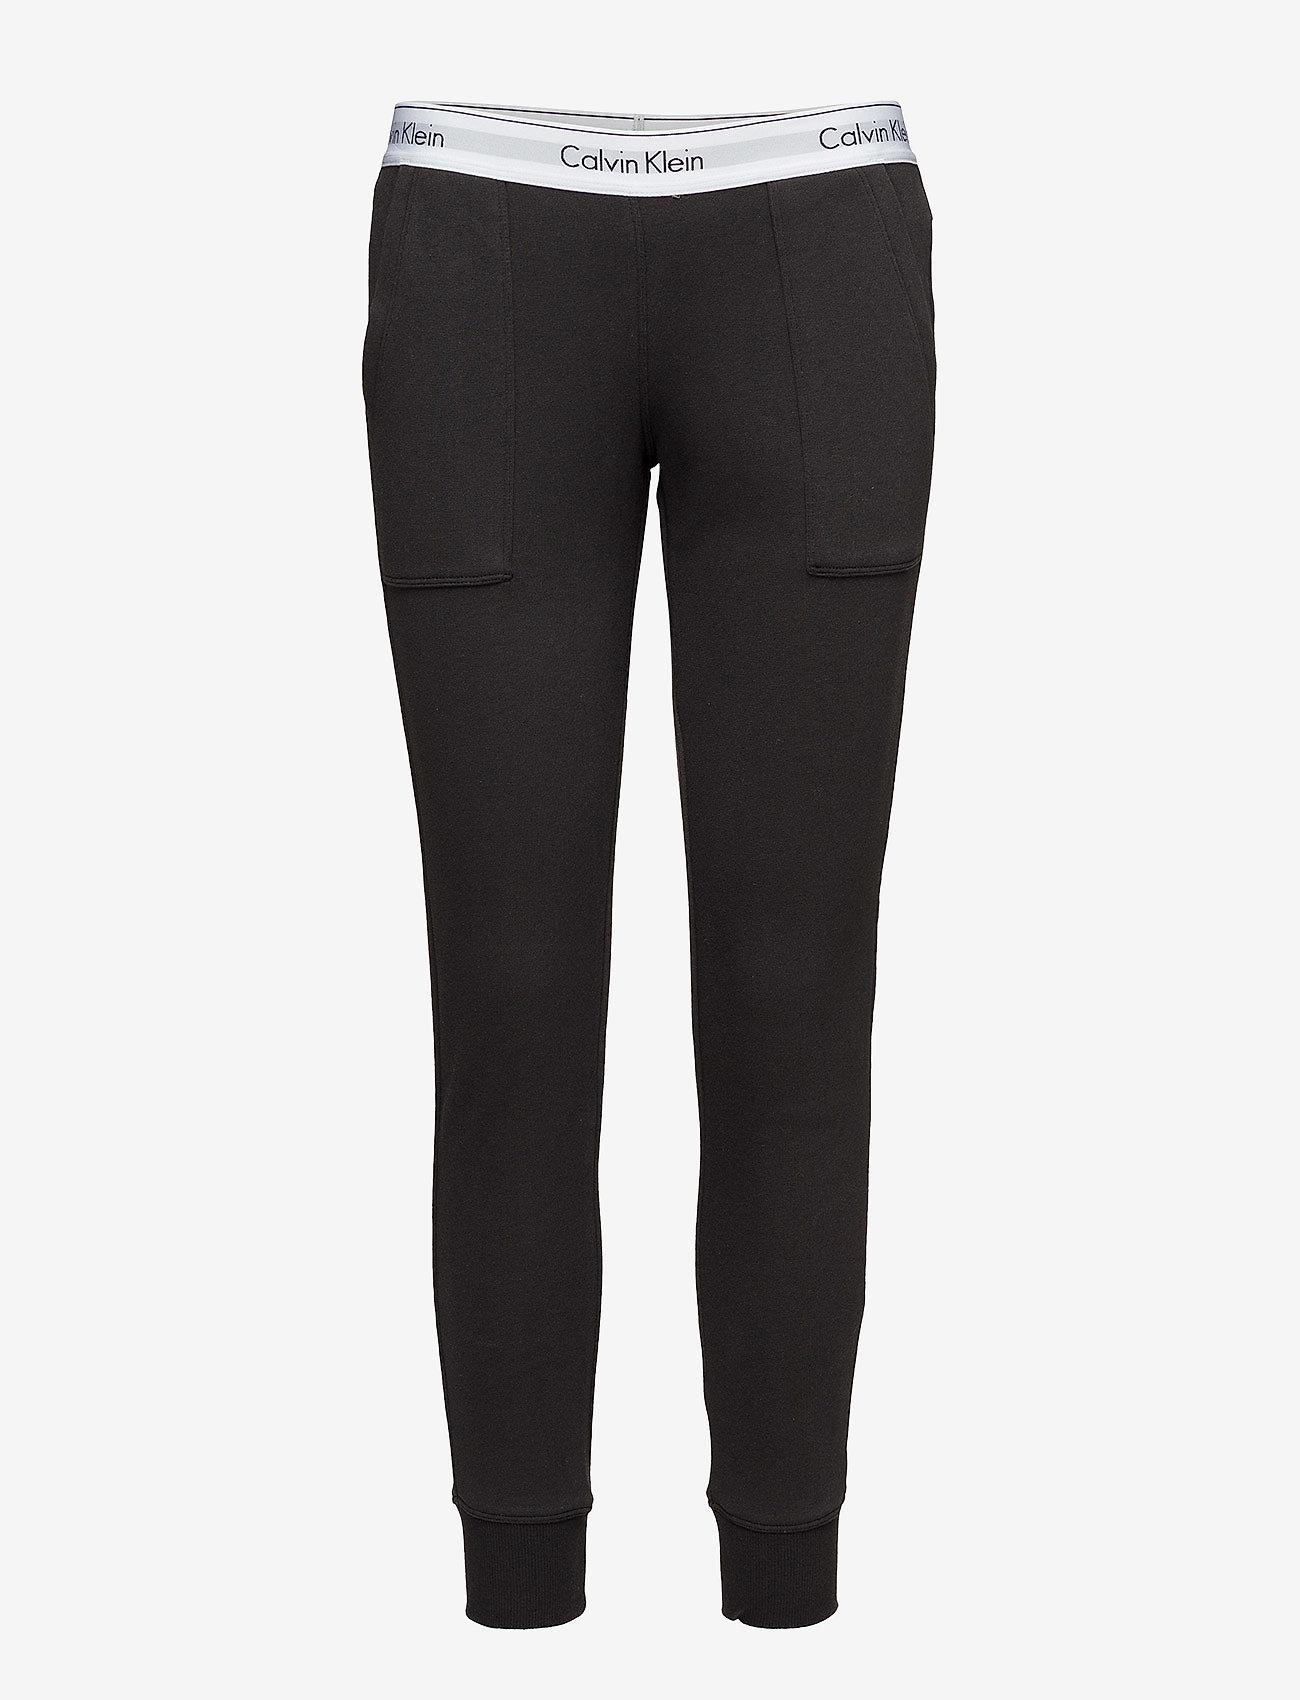 Calvin Klein - BOTTOM PANT JOGGER - doły - black - 1